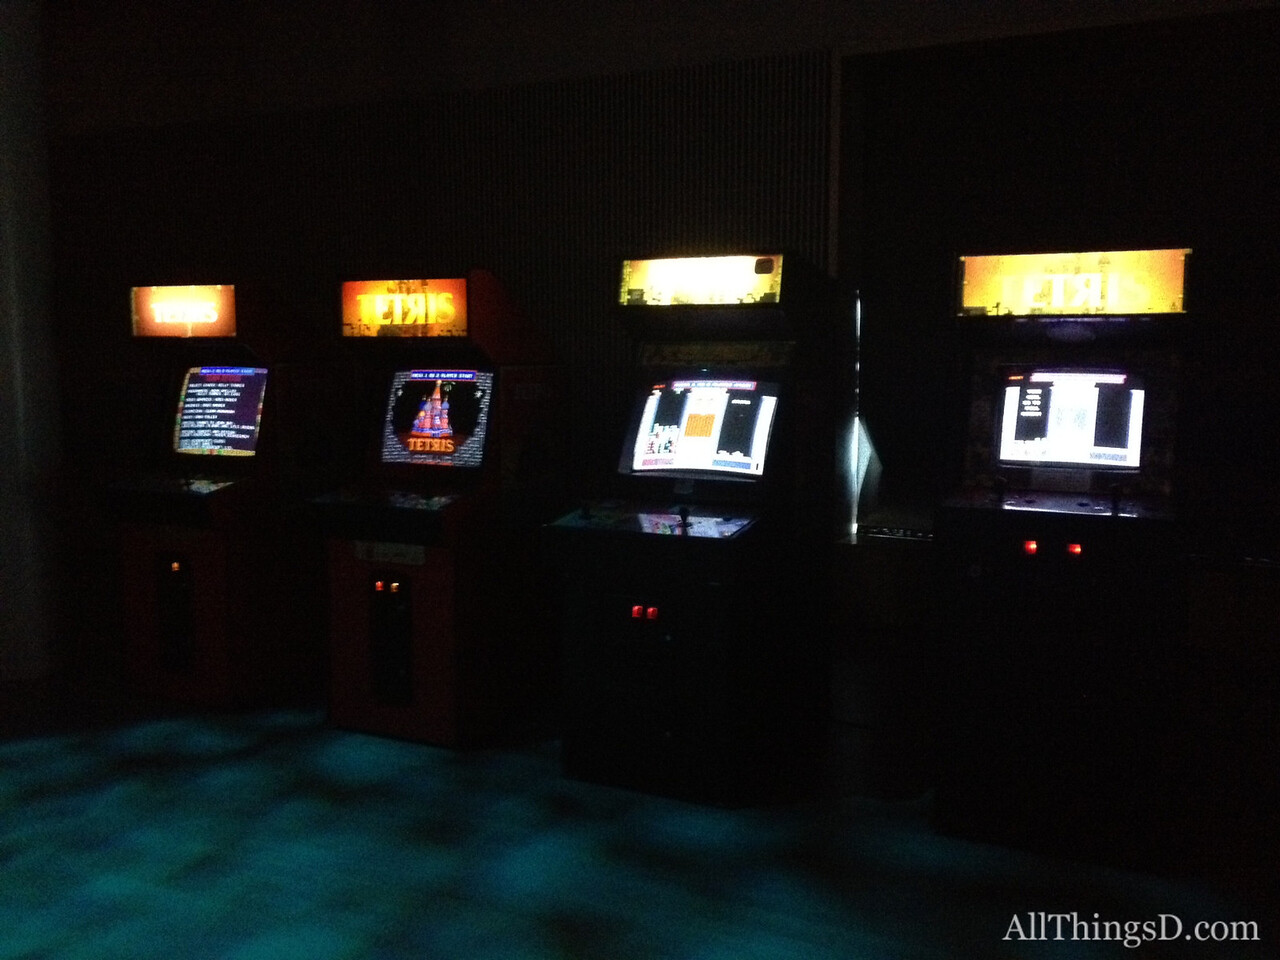 Tetris, Tetris everywhere!